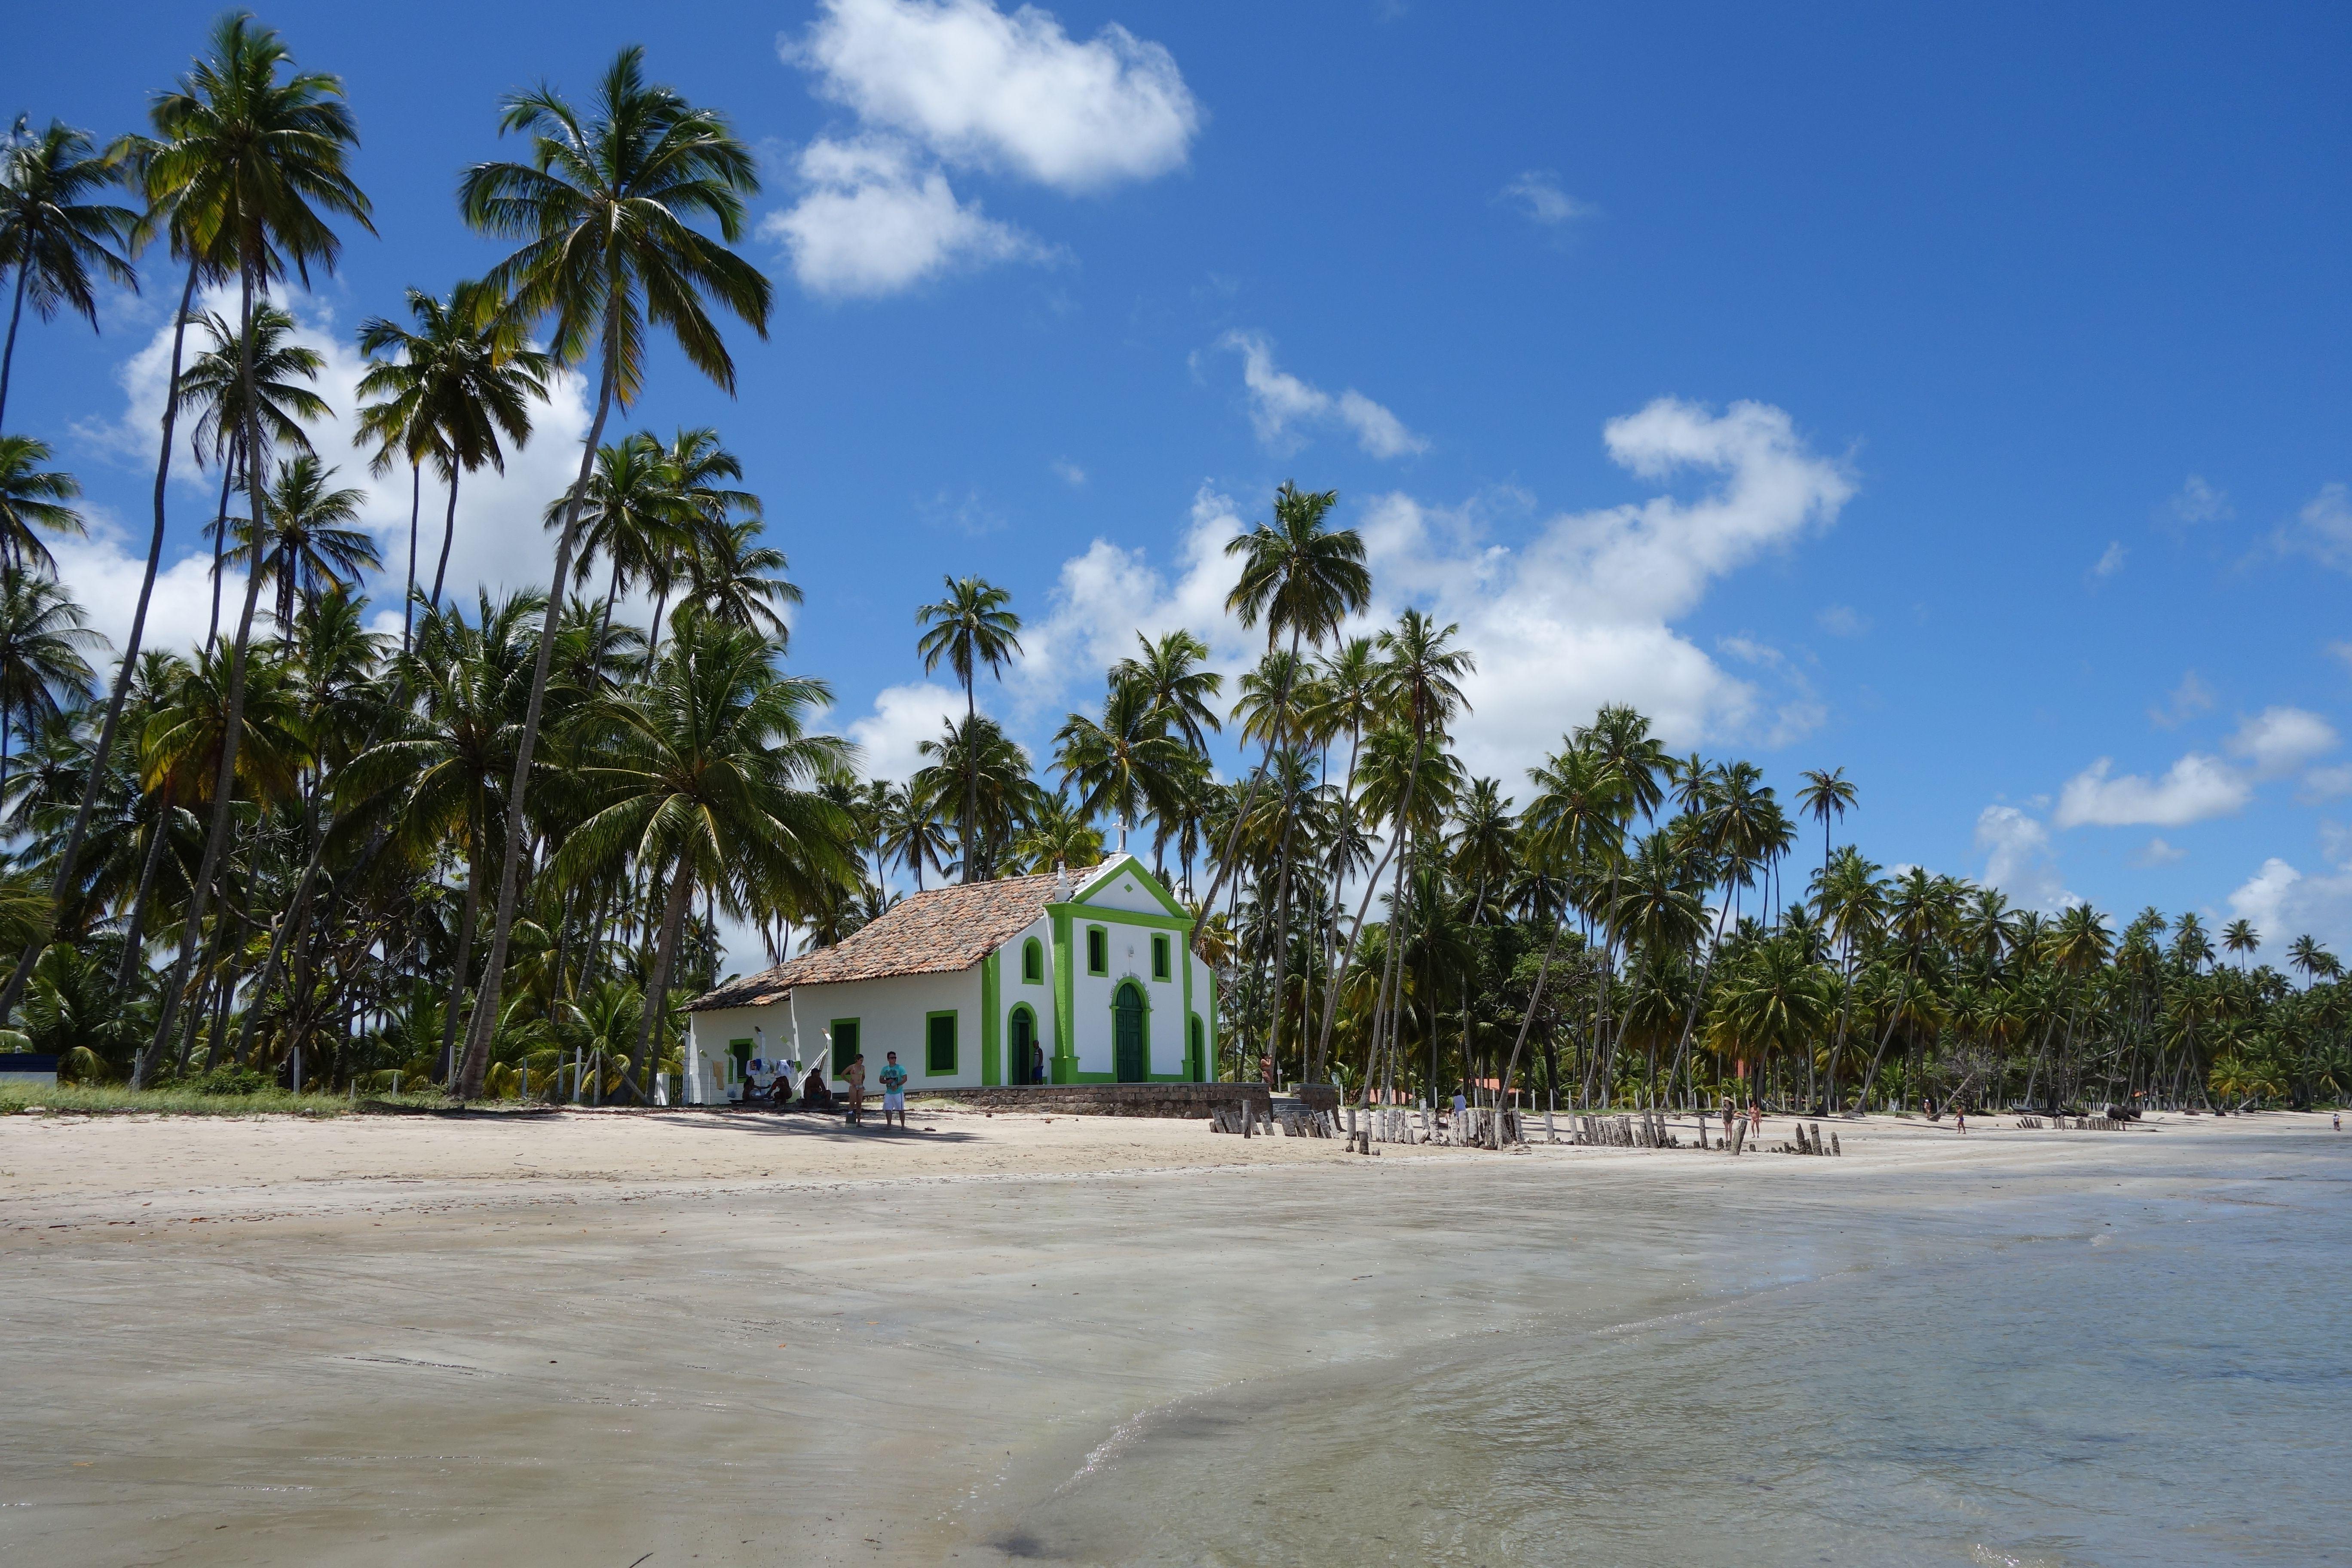 Photo by Daniel Leite, Carneiros Beach, Pernambuco, Brazil